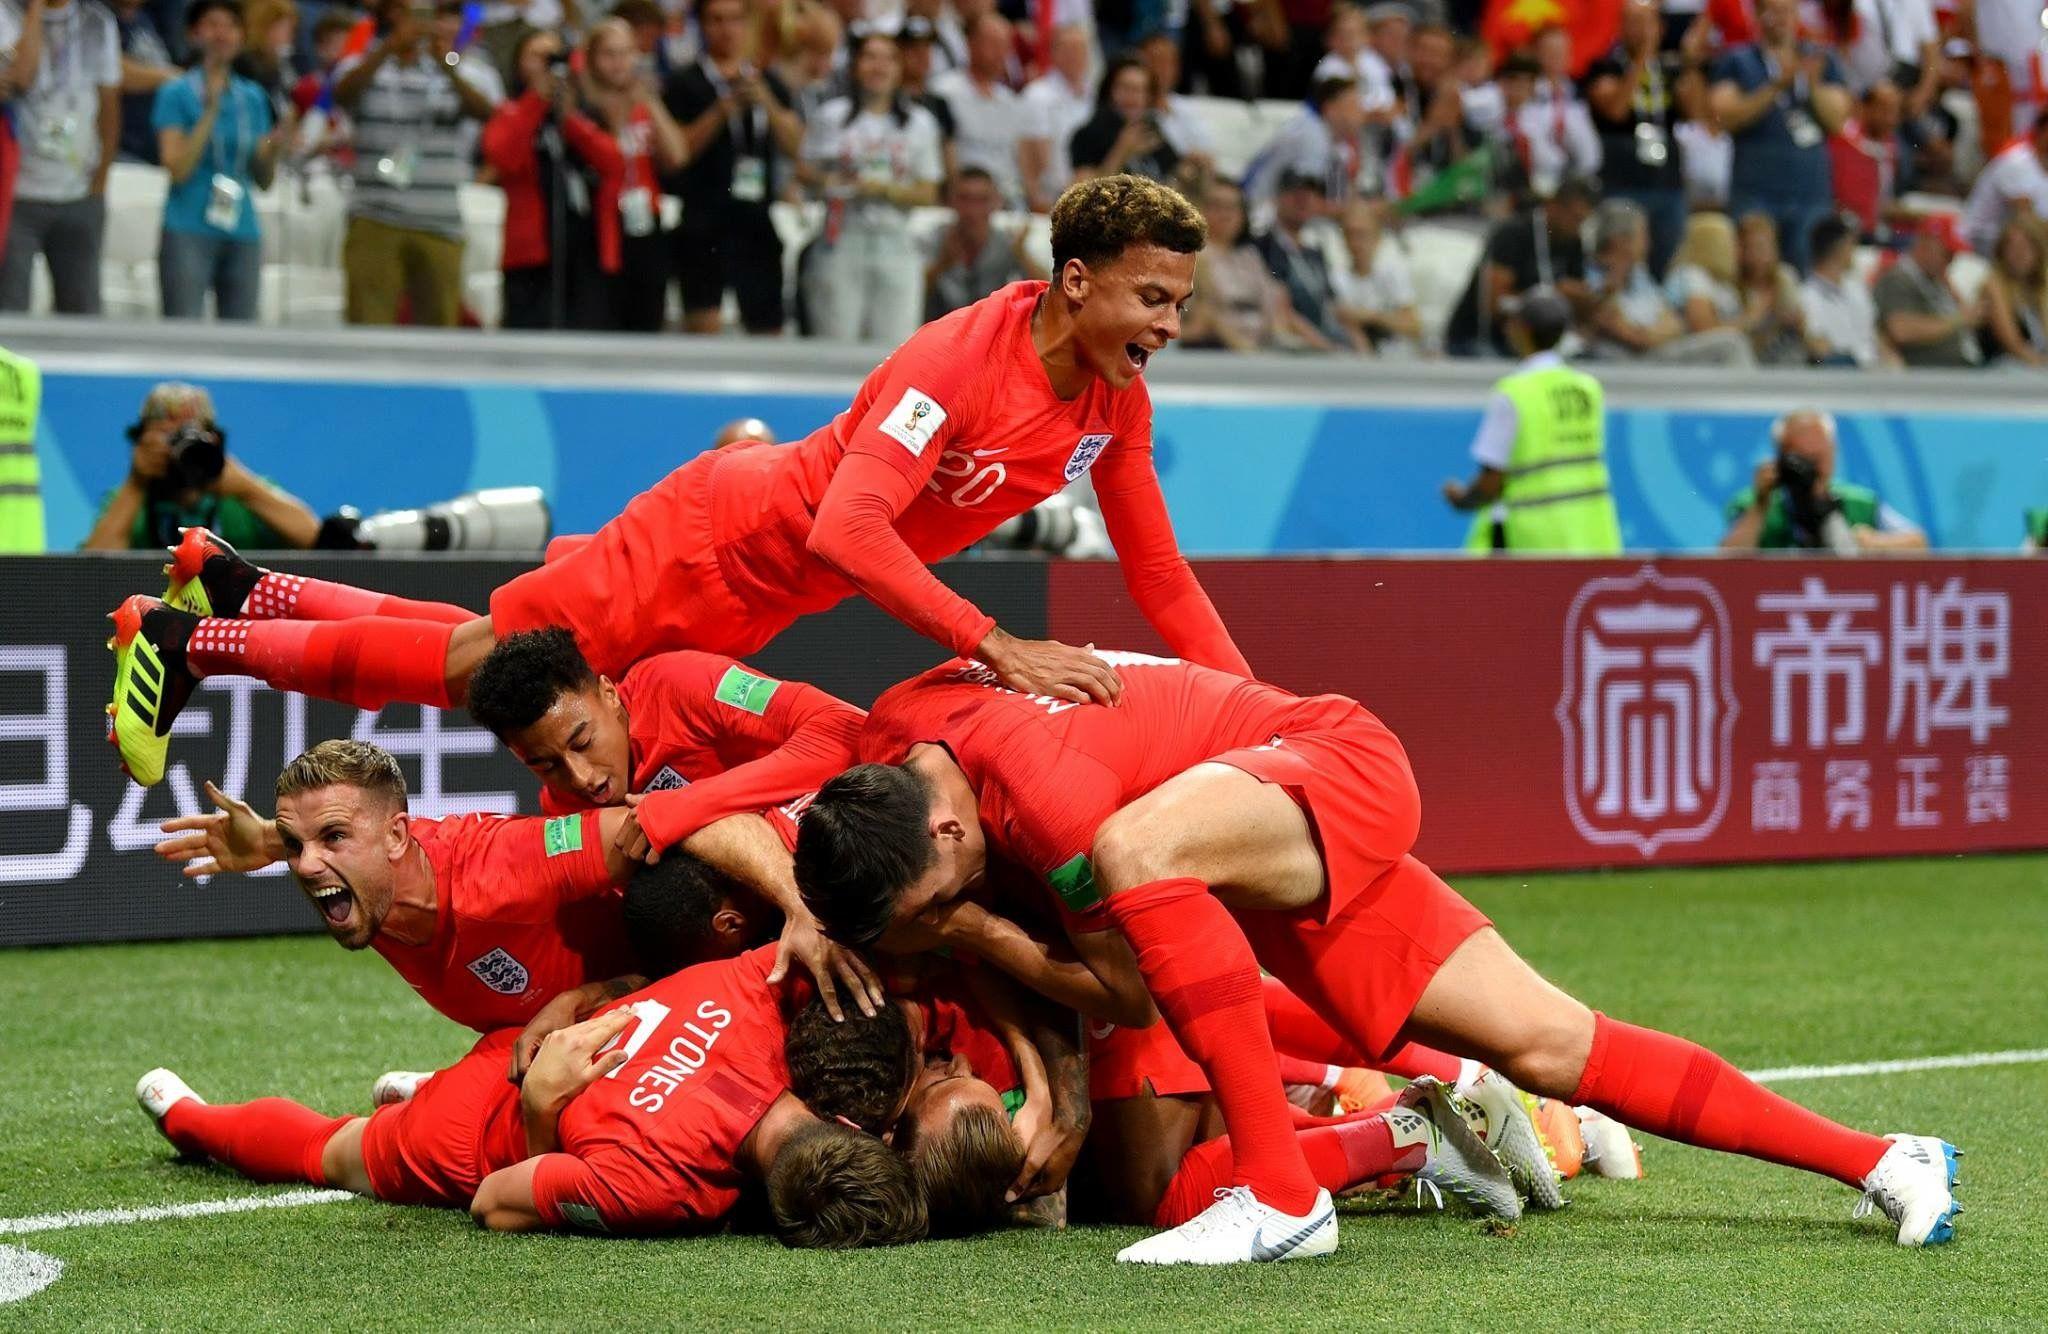 2018 Fifa World Cup England Vs Tunisia Group G Fifa World Cup Fifa World Cup